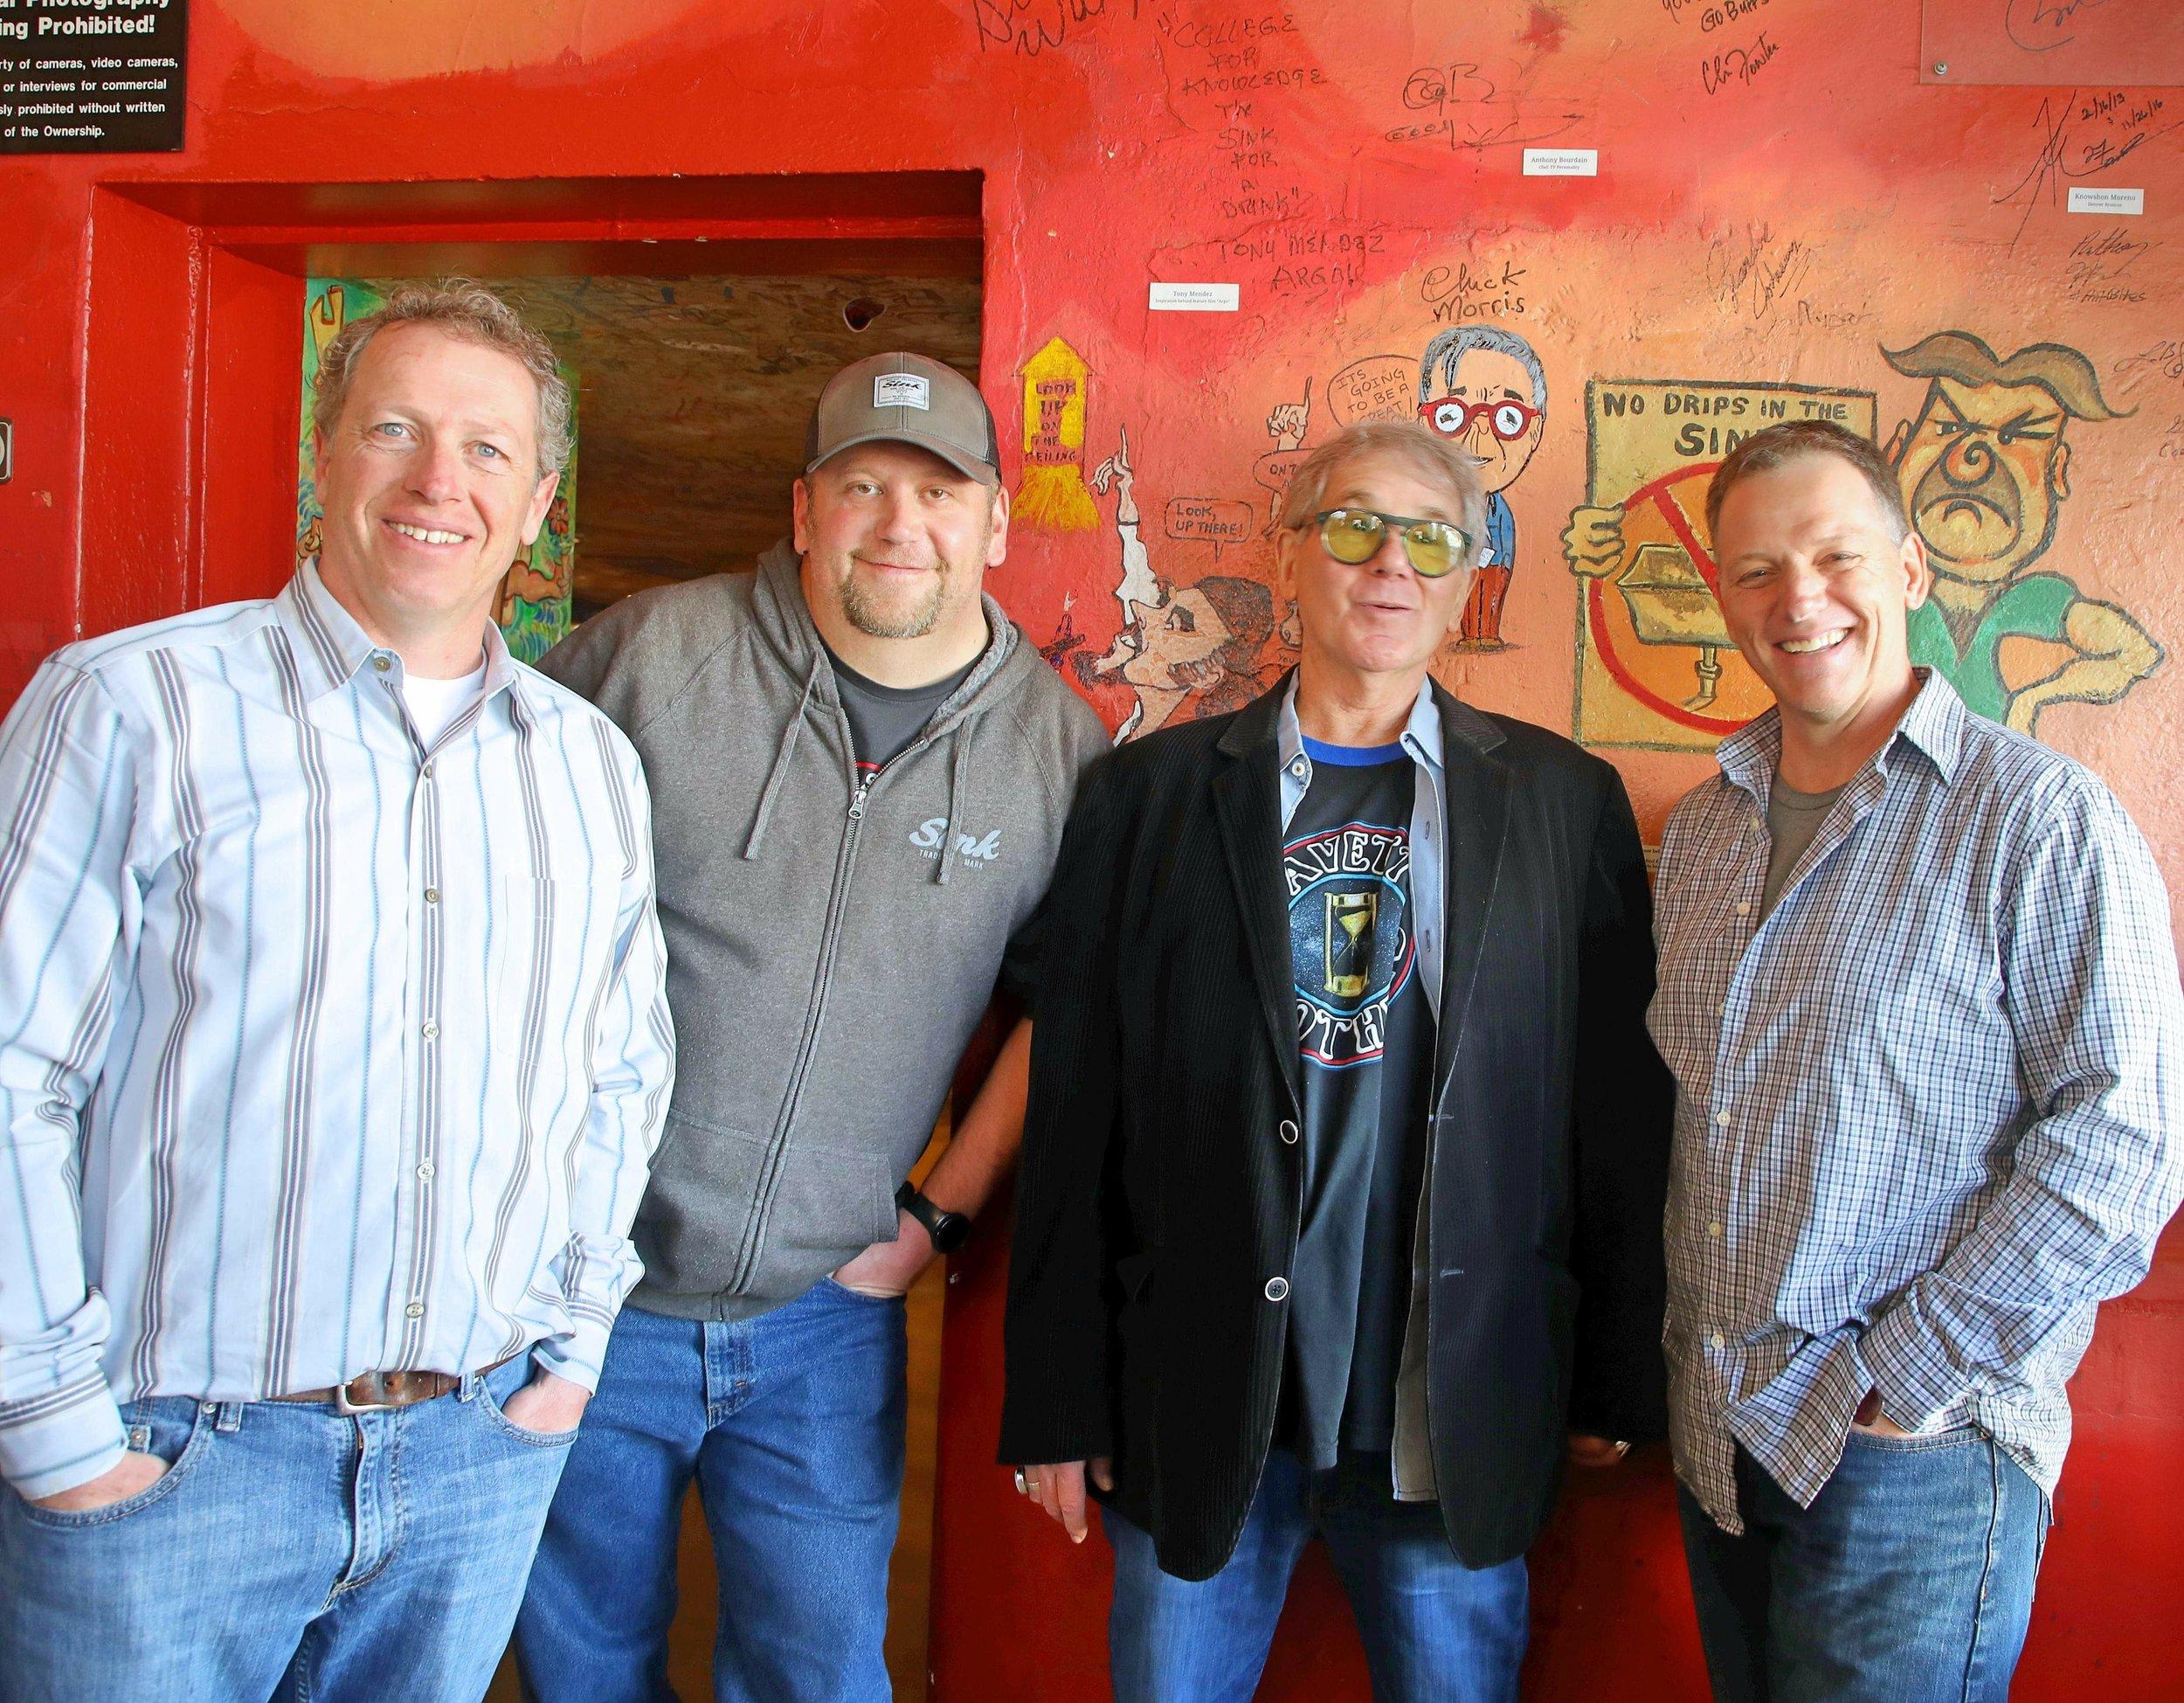 From left to right: Owners, Chris Heinritz, Tell Jones, Chuck Morris, and owner, Mark Heinritz